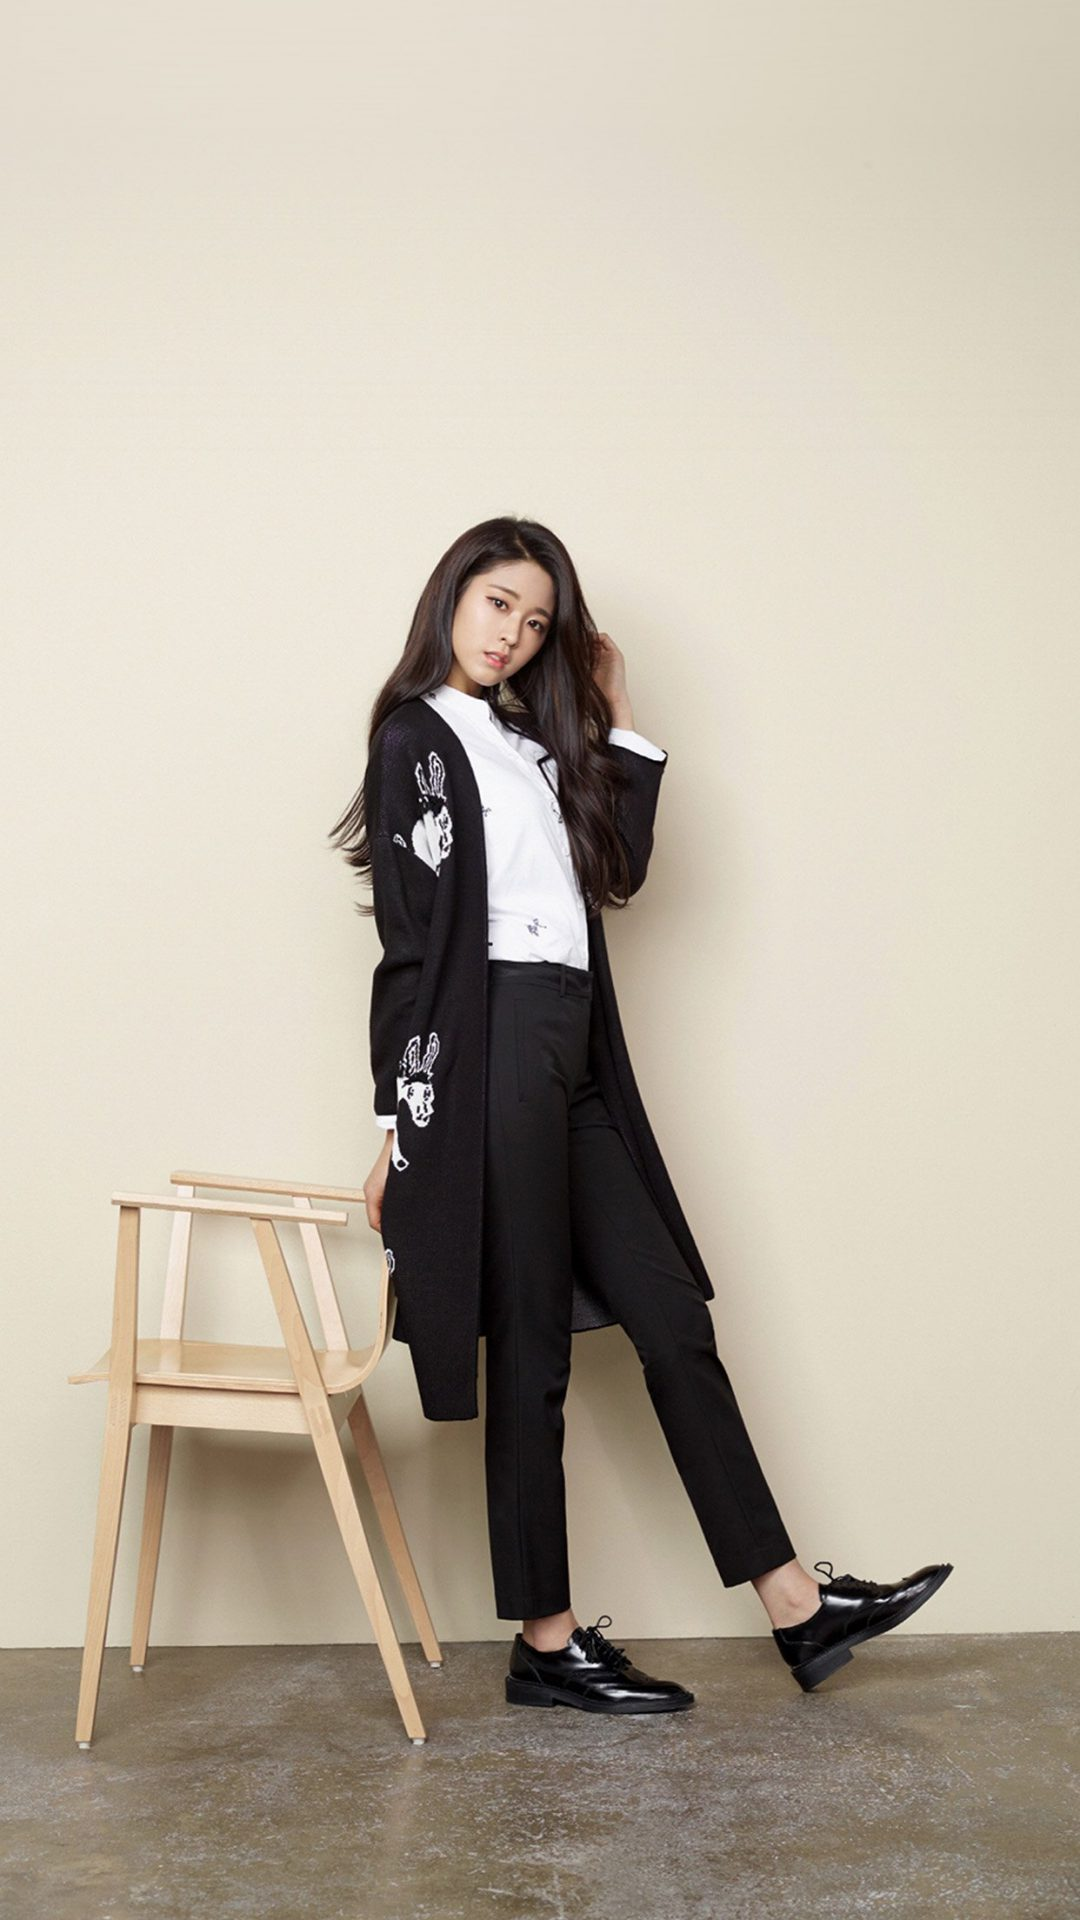 Kpop Girl Seolhyun